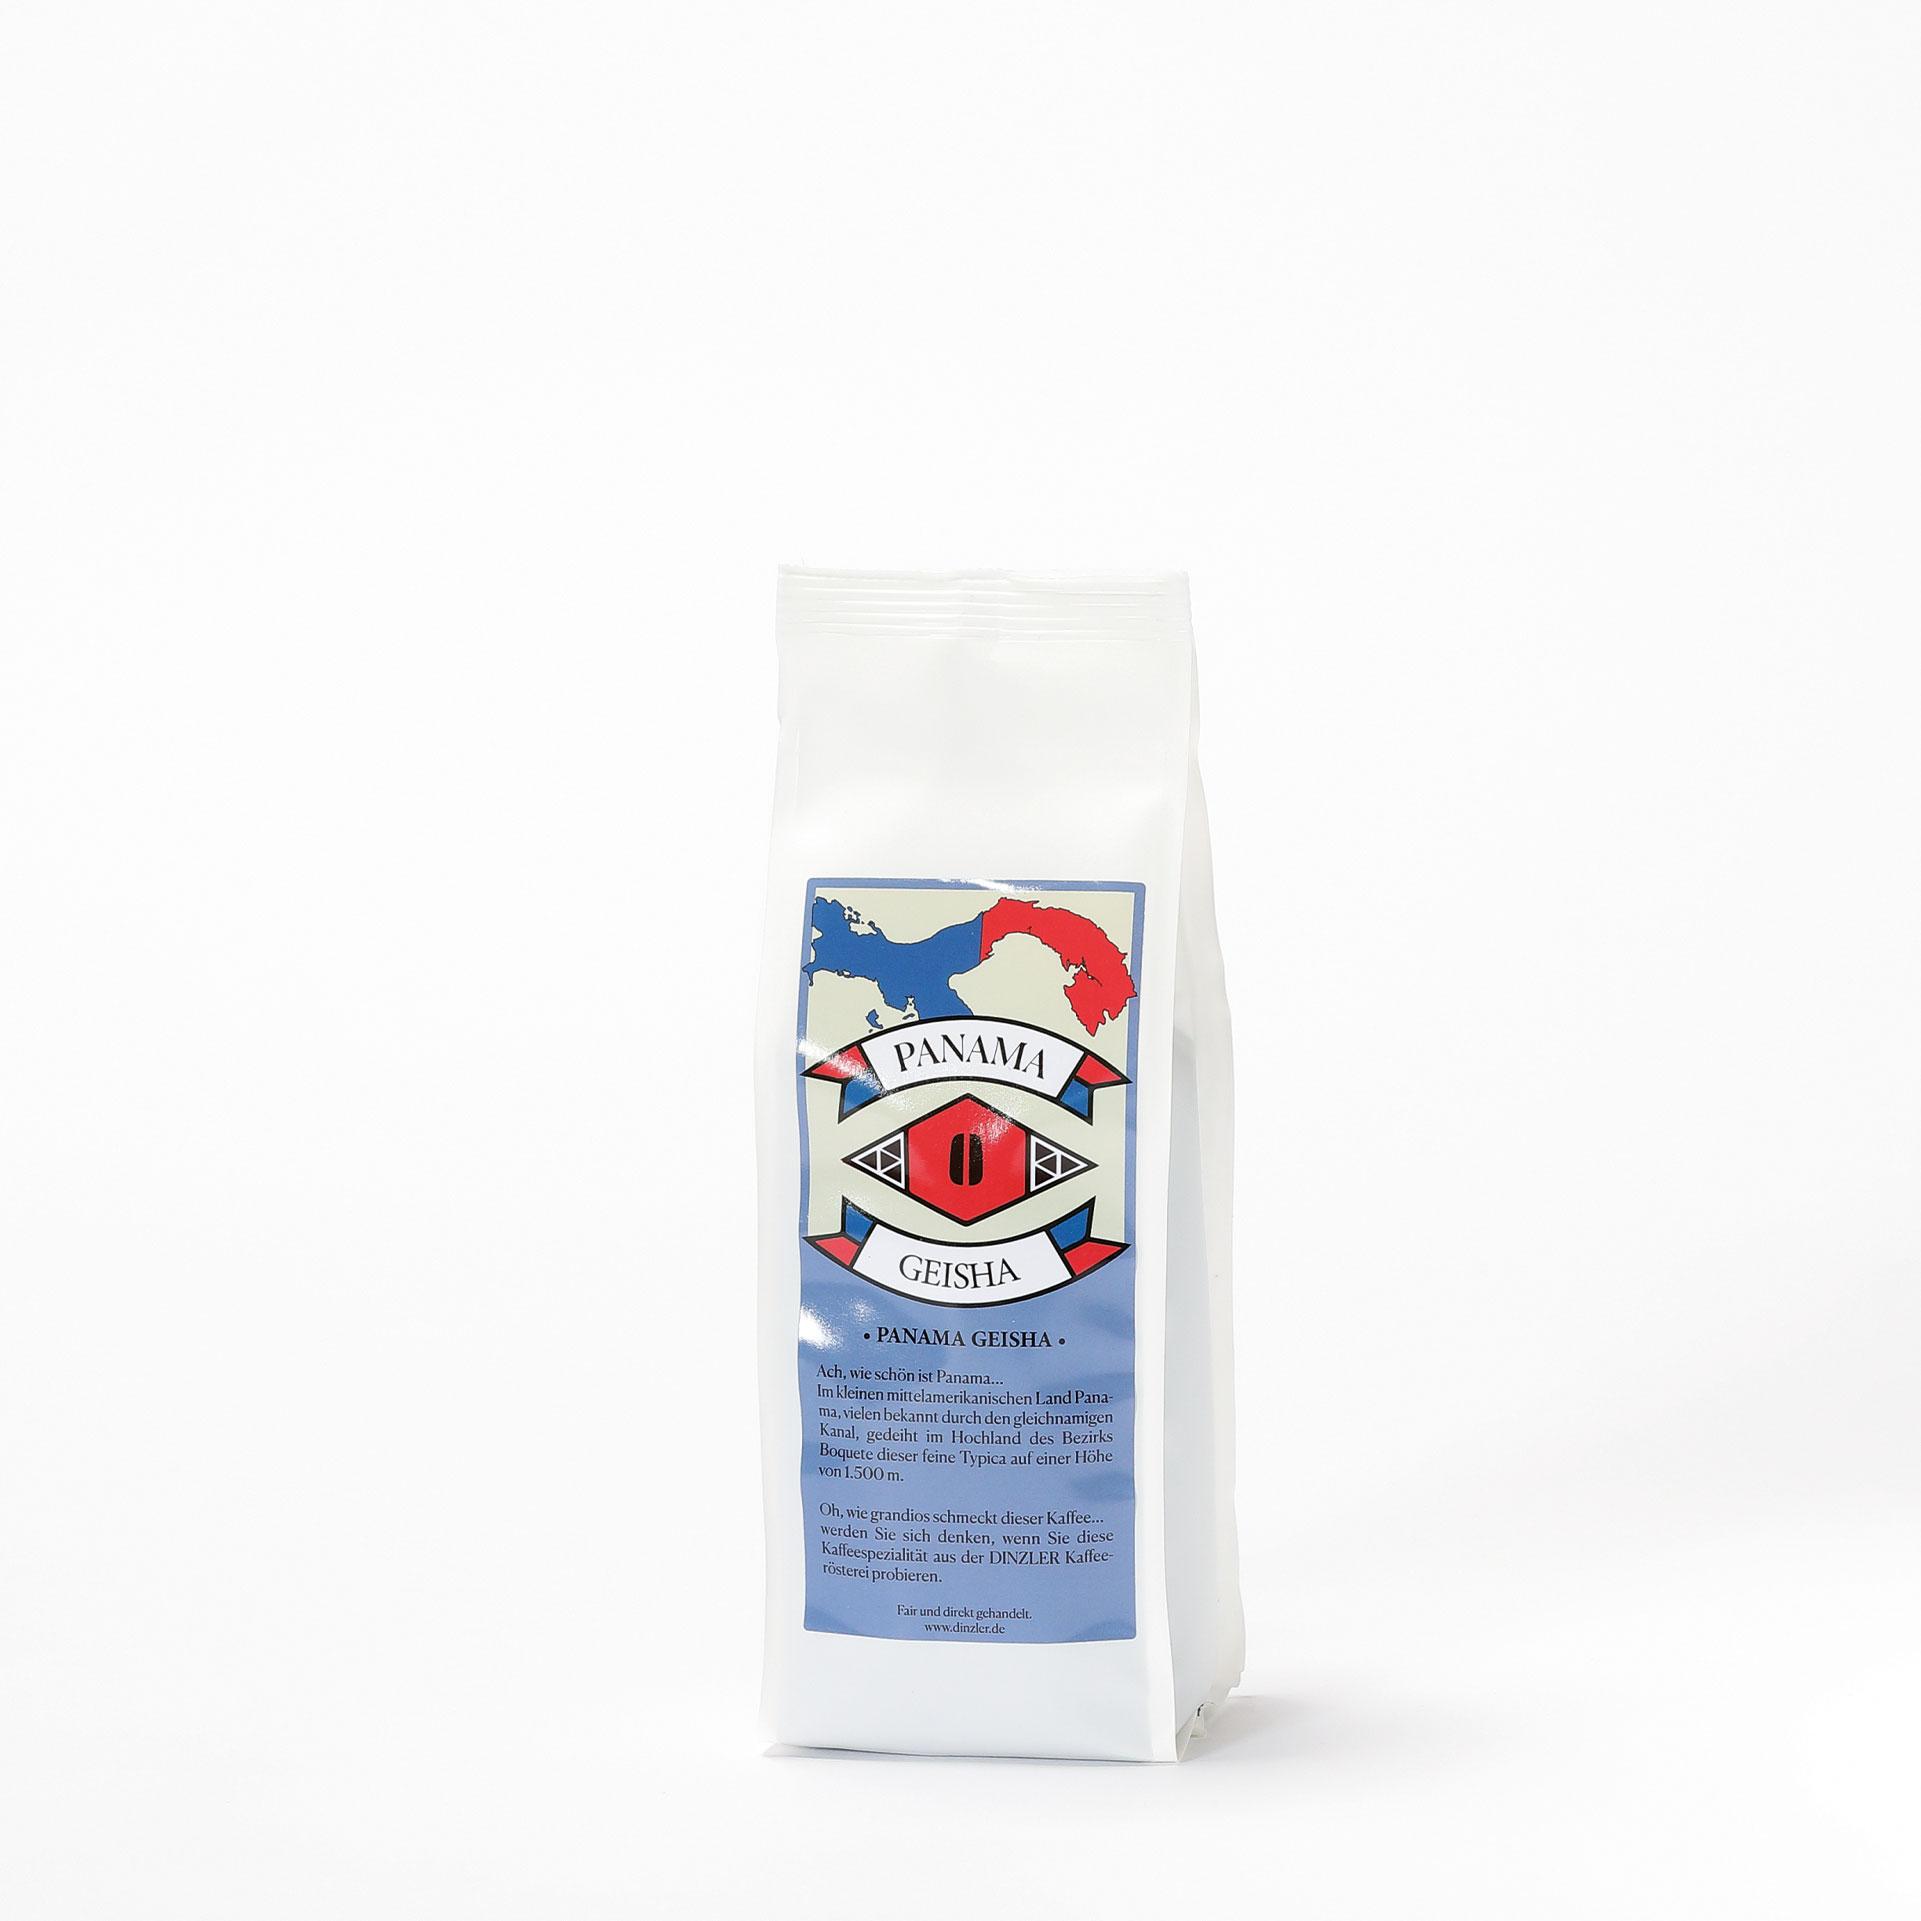 DINZLER Kaffee Panama Geisha